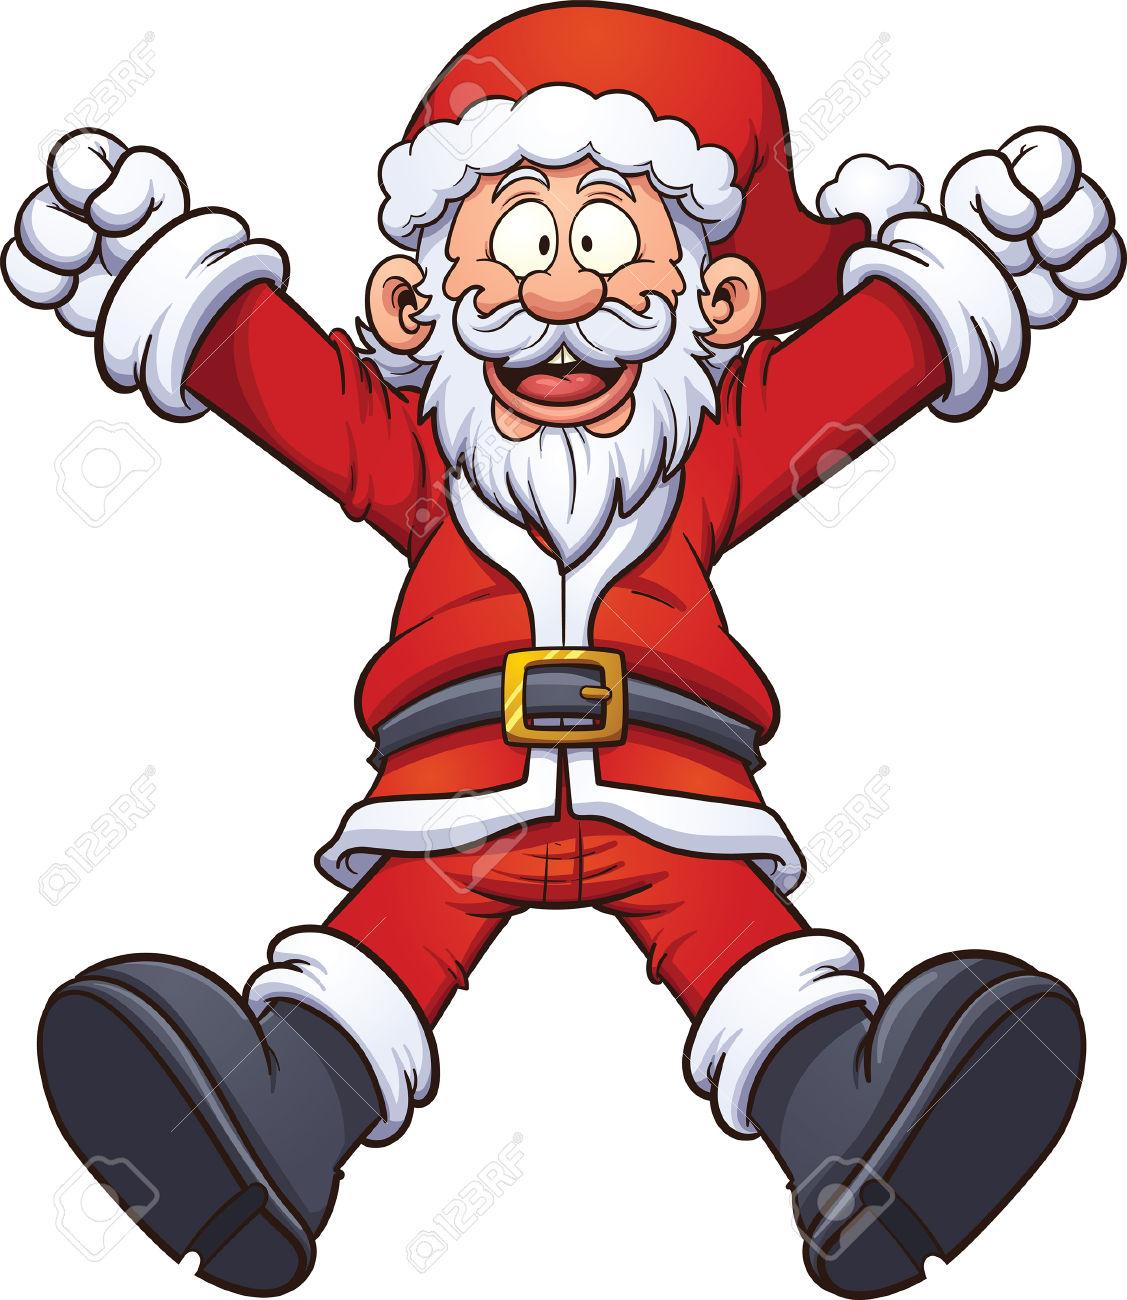 Santa Claus Stock Photos Images. Royalty Free Santa Claus Images.